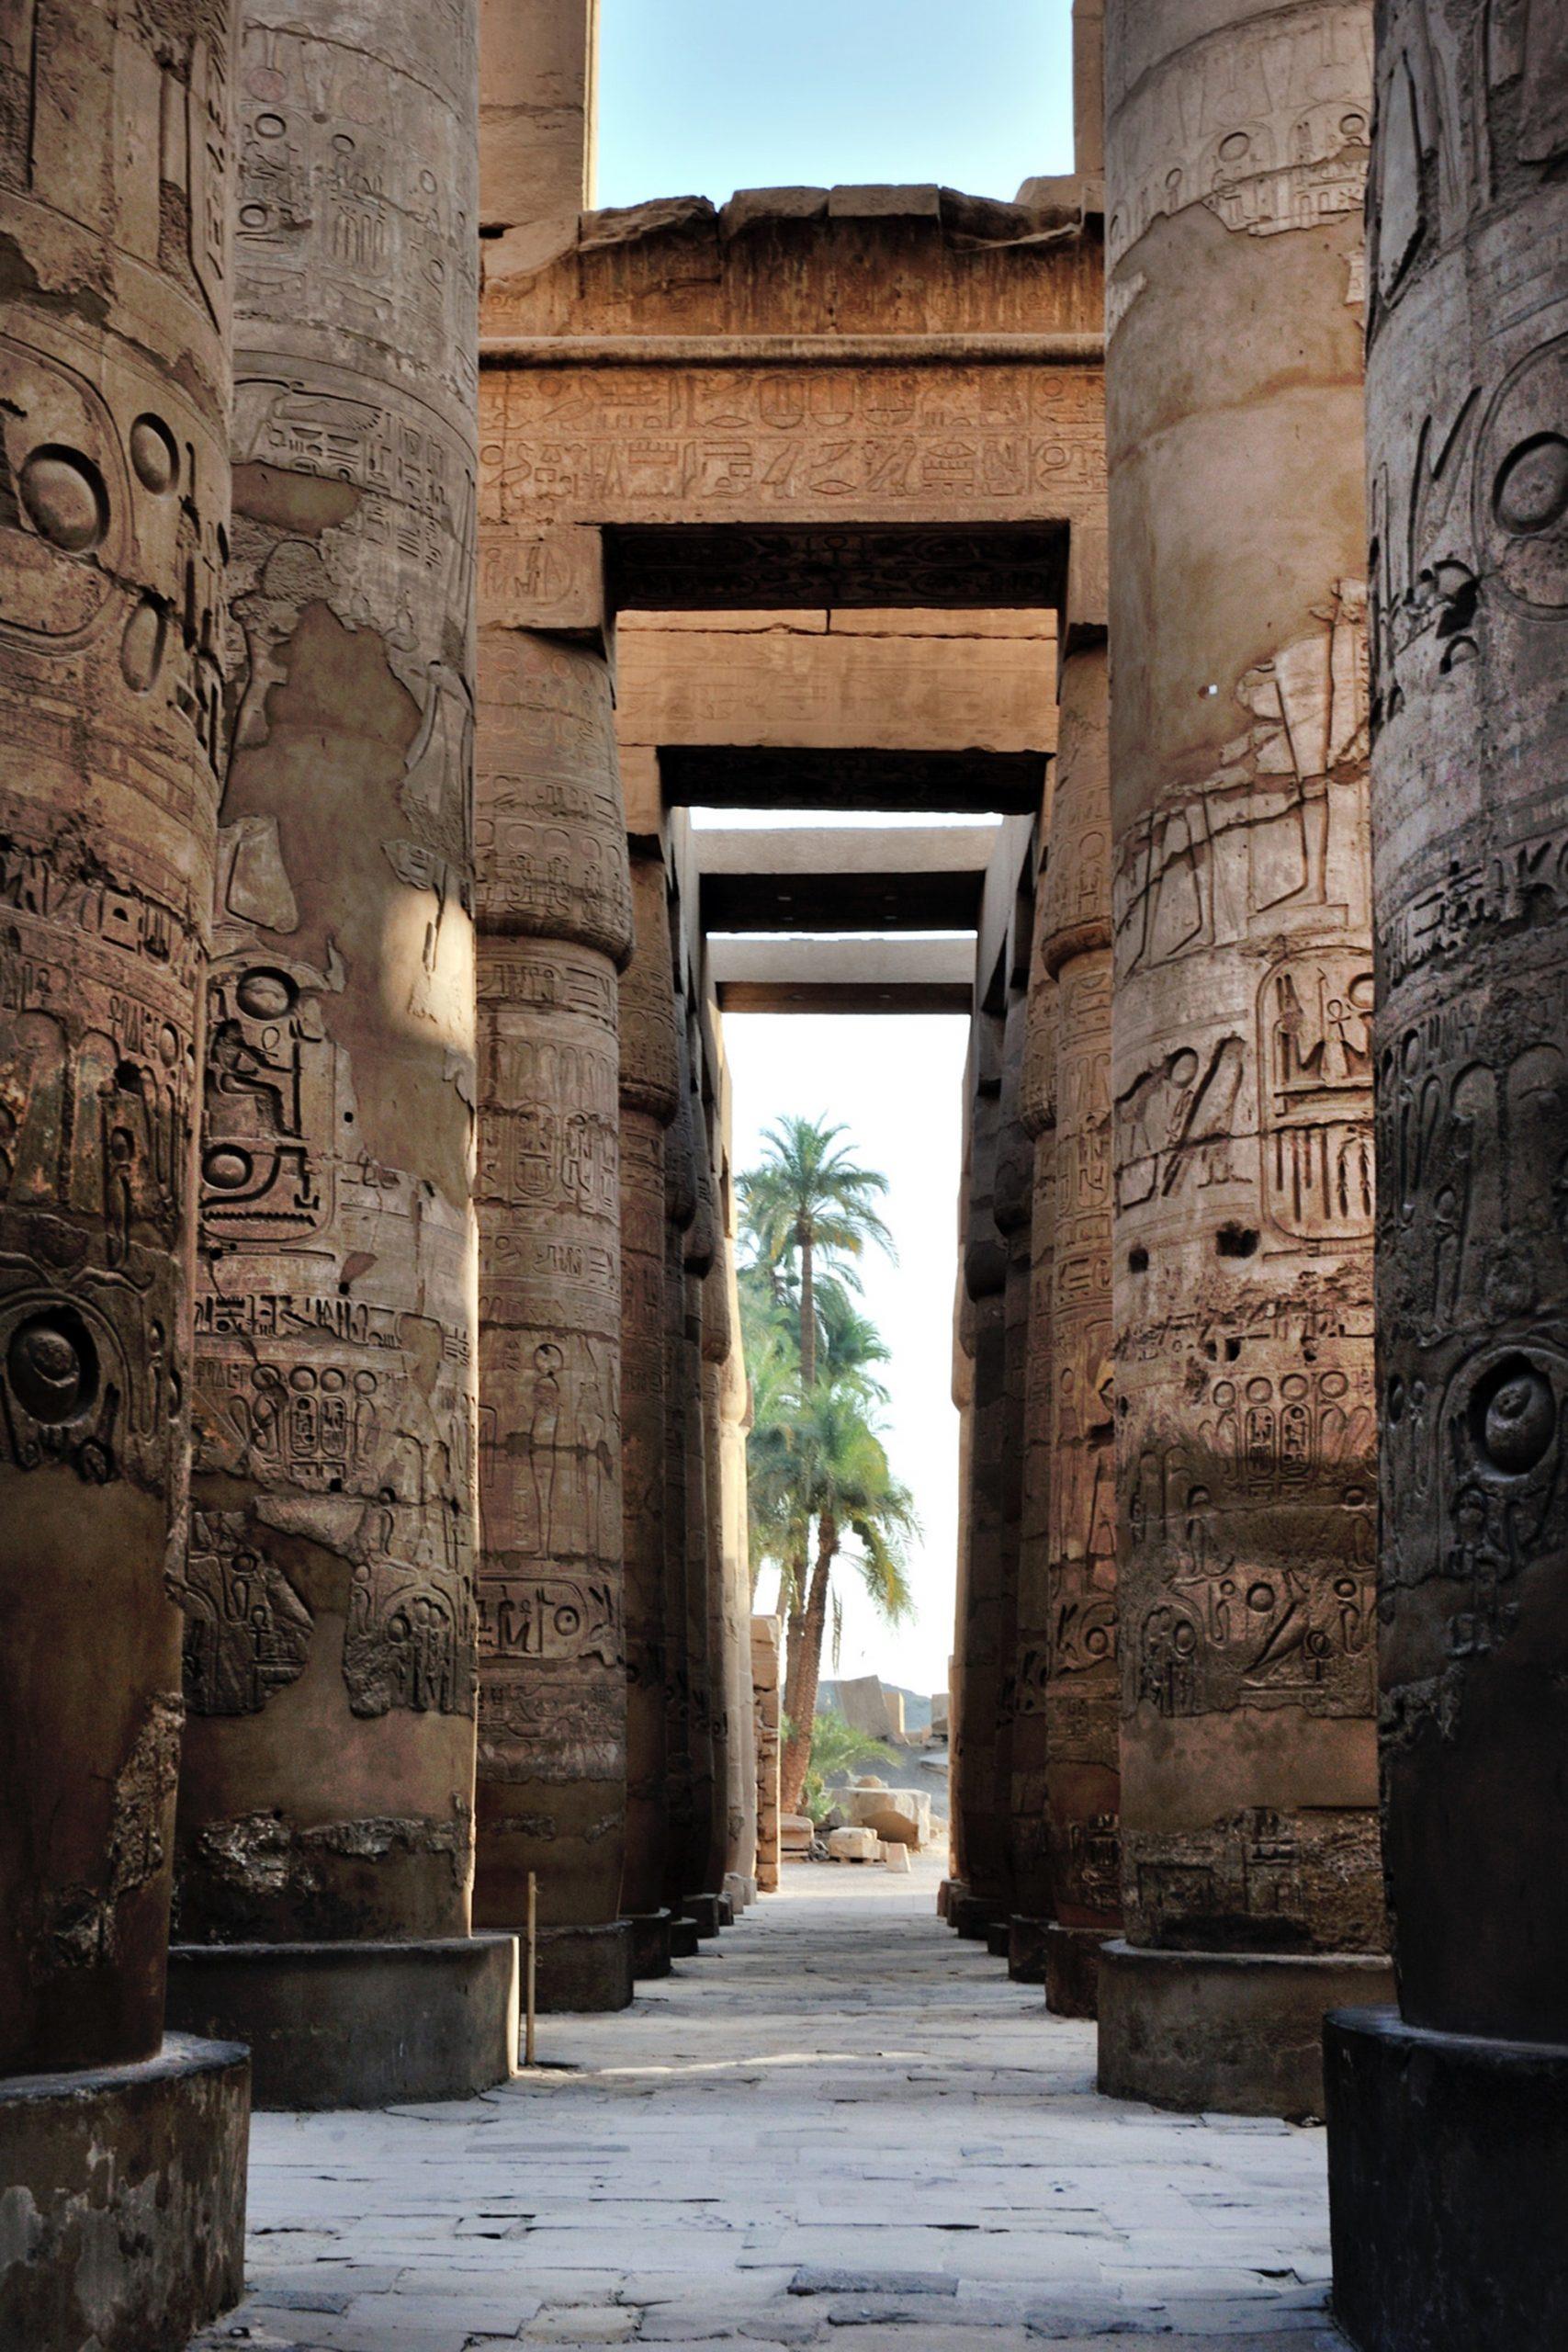 EGIPTO COLUMNAS - THE INDIANA TRAVEL